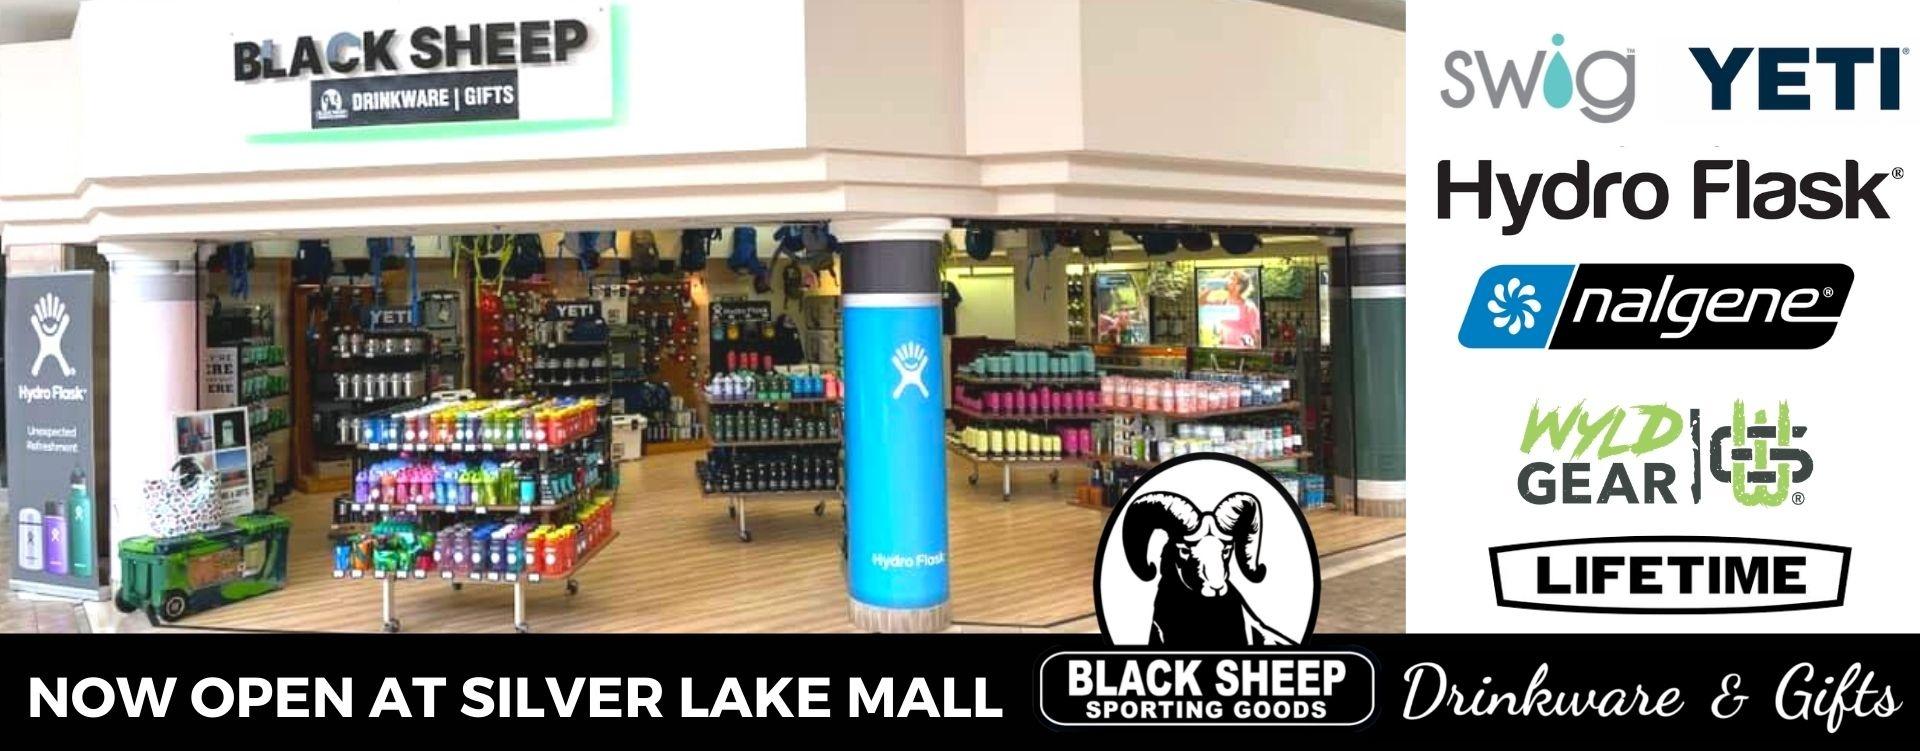 Black Sheep Drinkware & Gifts